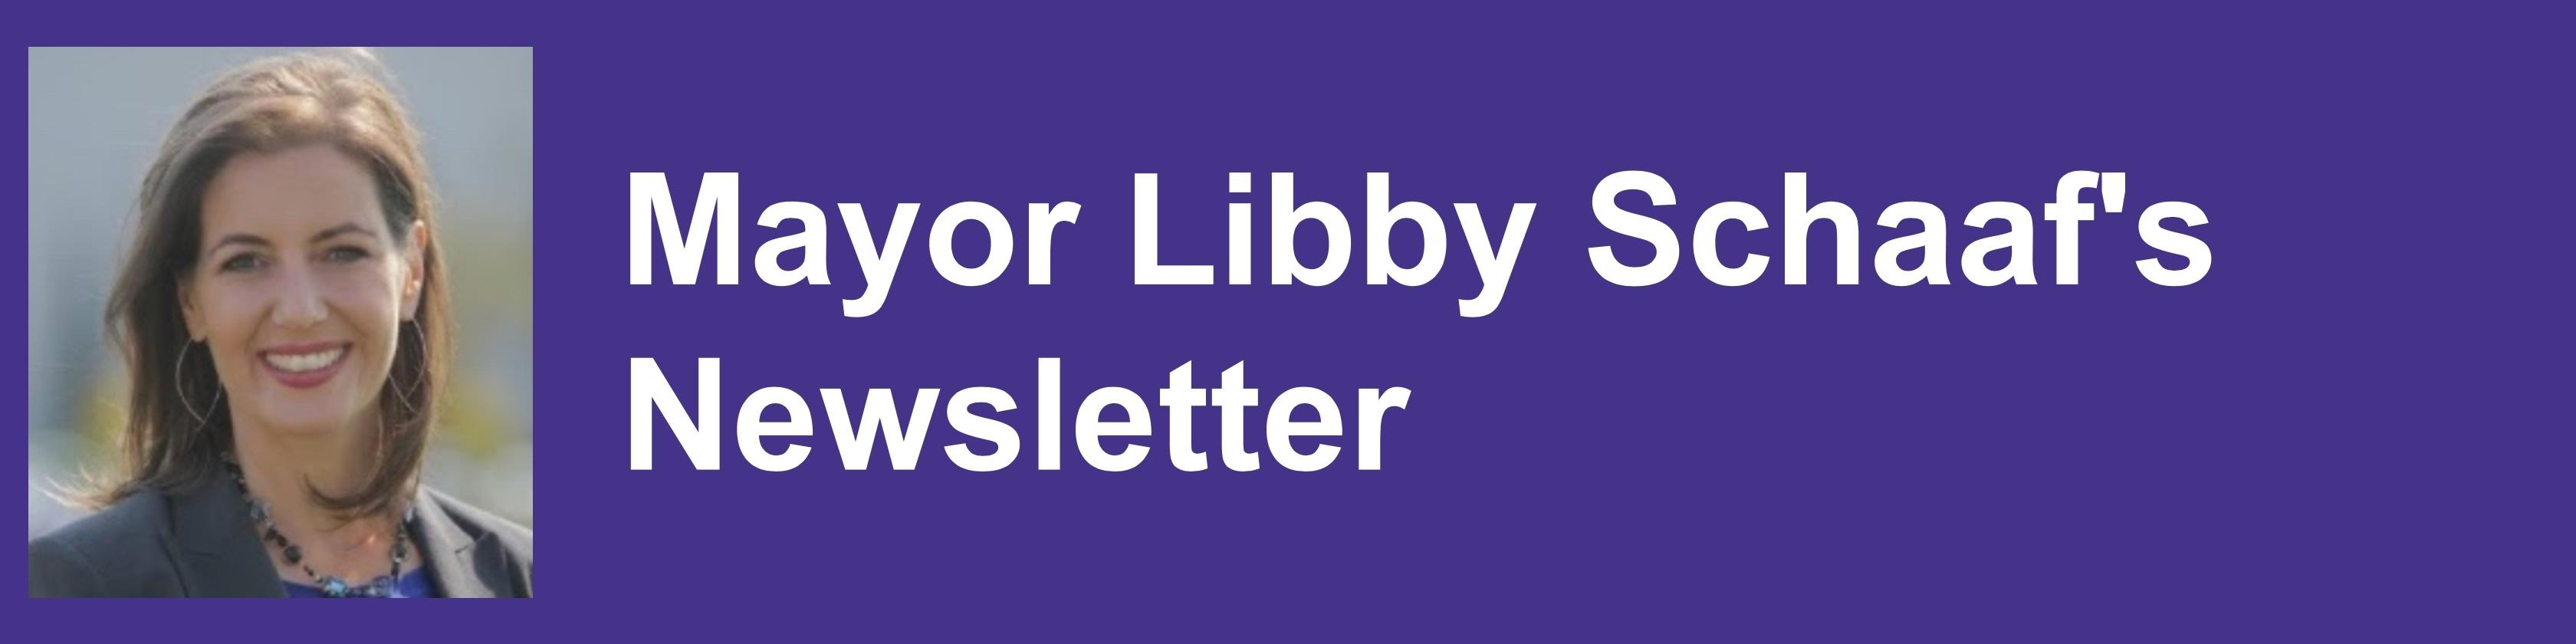 Mayor Schaaf Newsletter banner